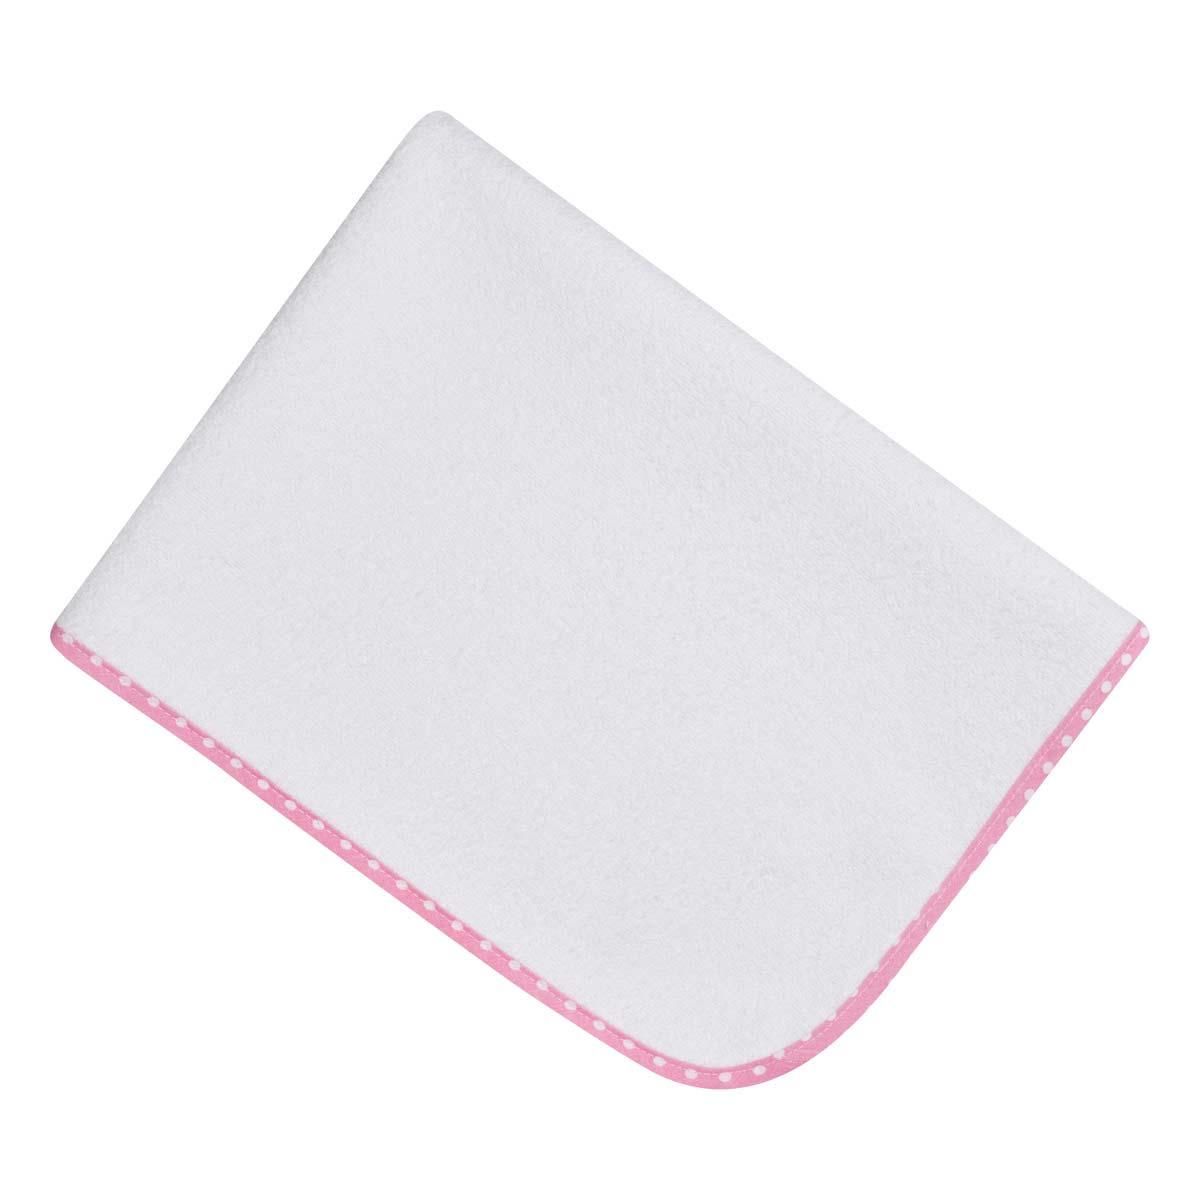 Bunny bebe σελτεδάκι 45×65 με ρέλι ροζ πουά